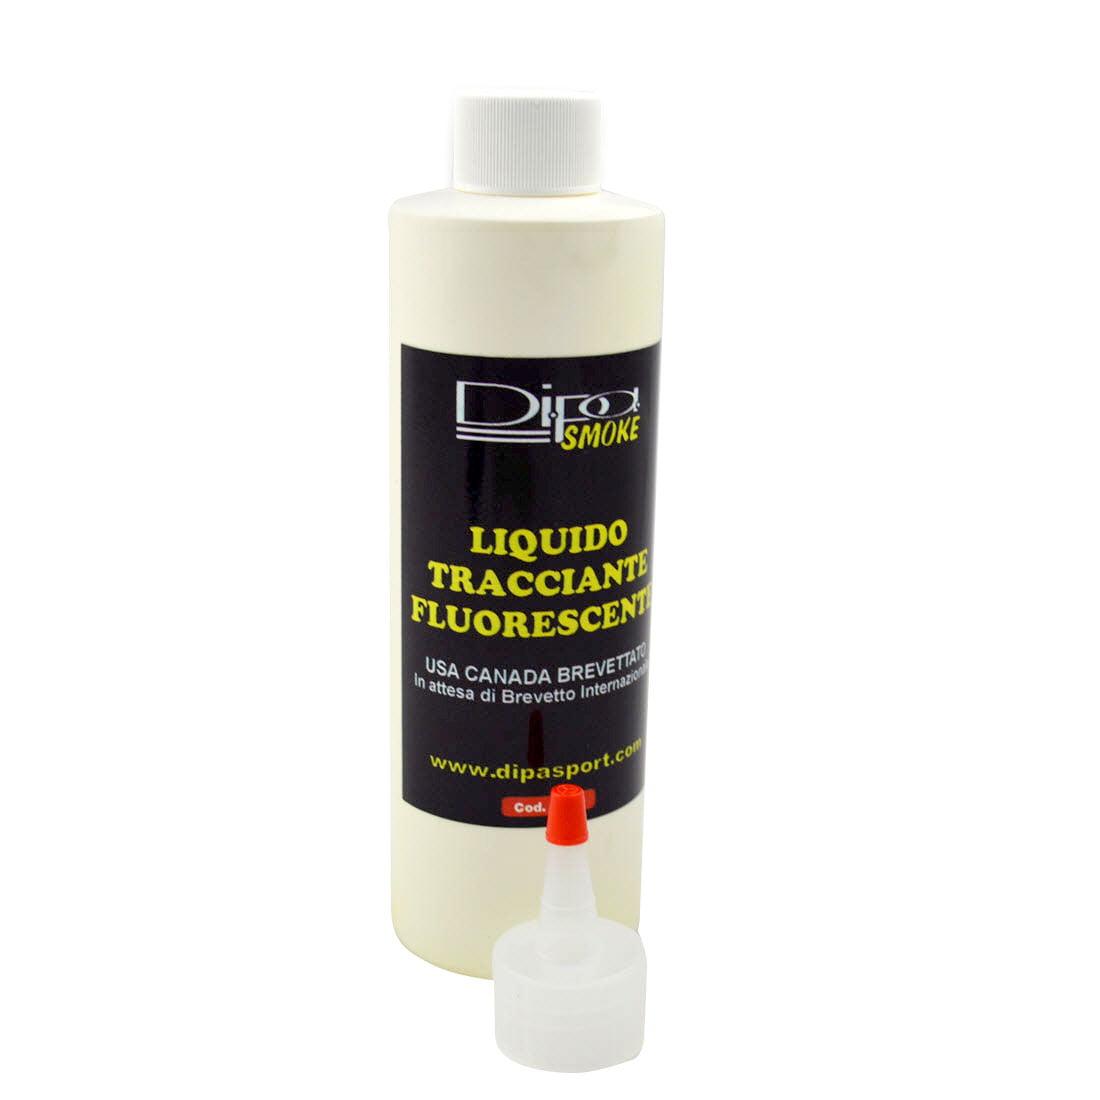 Leak-tester-smoke-machine-flourescent-dye